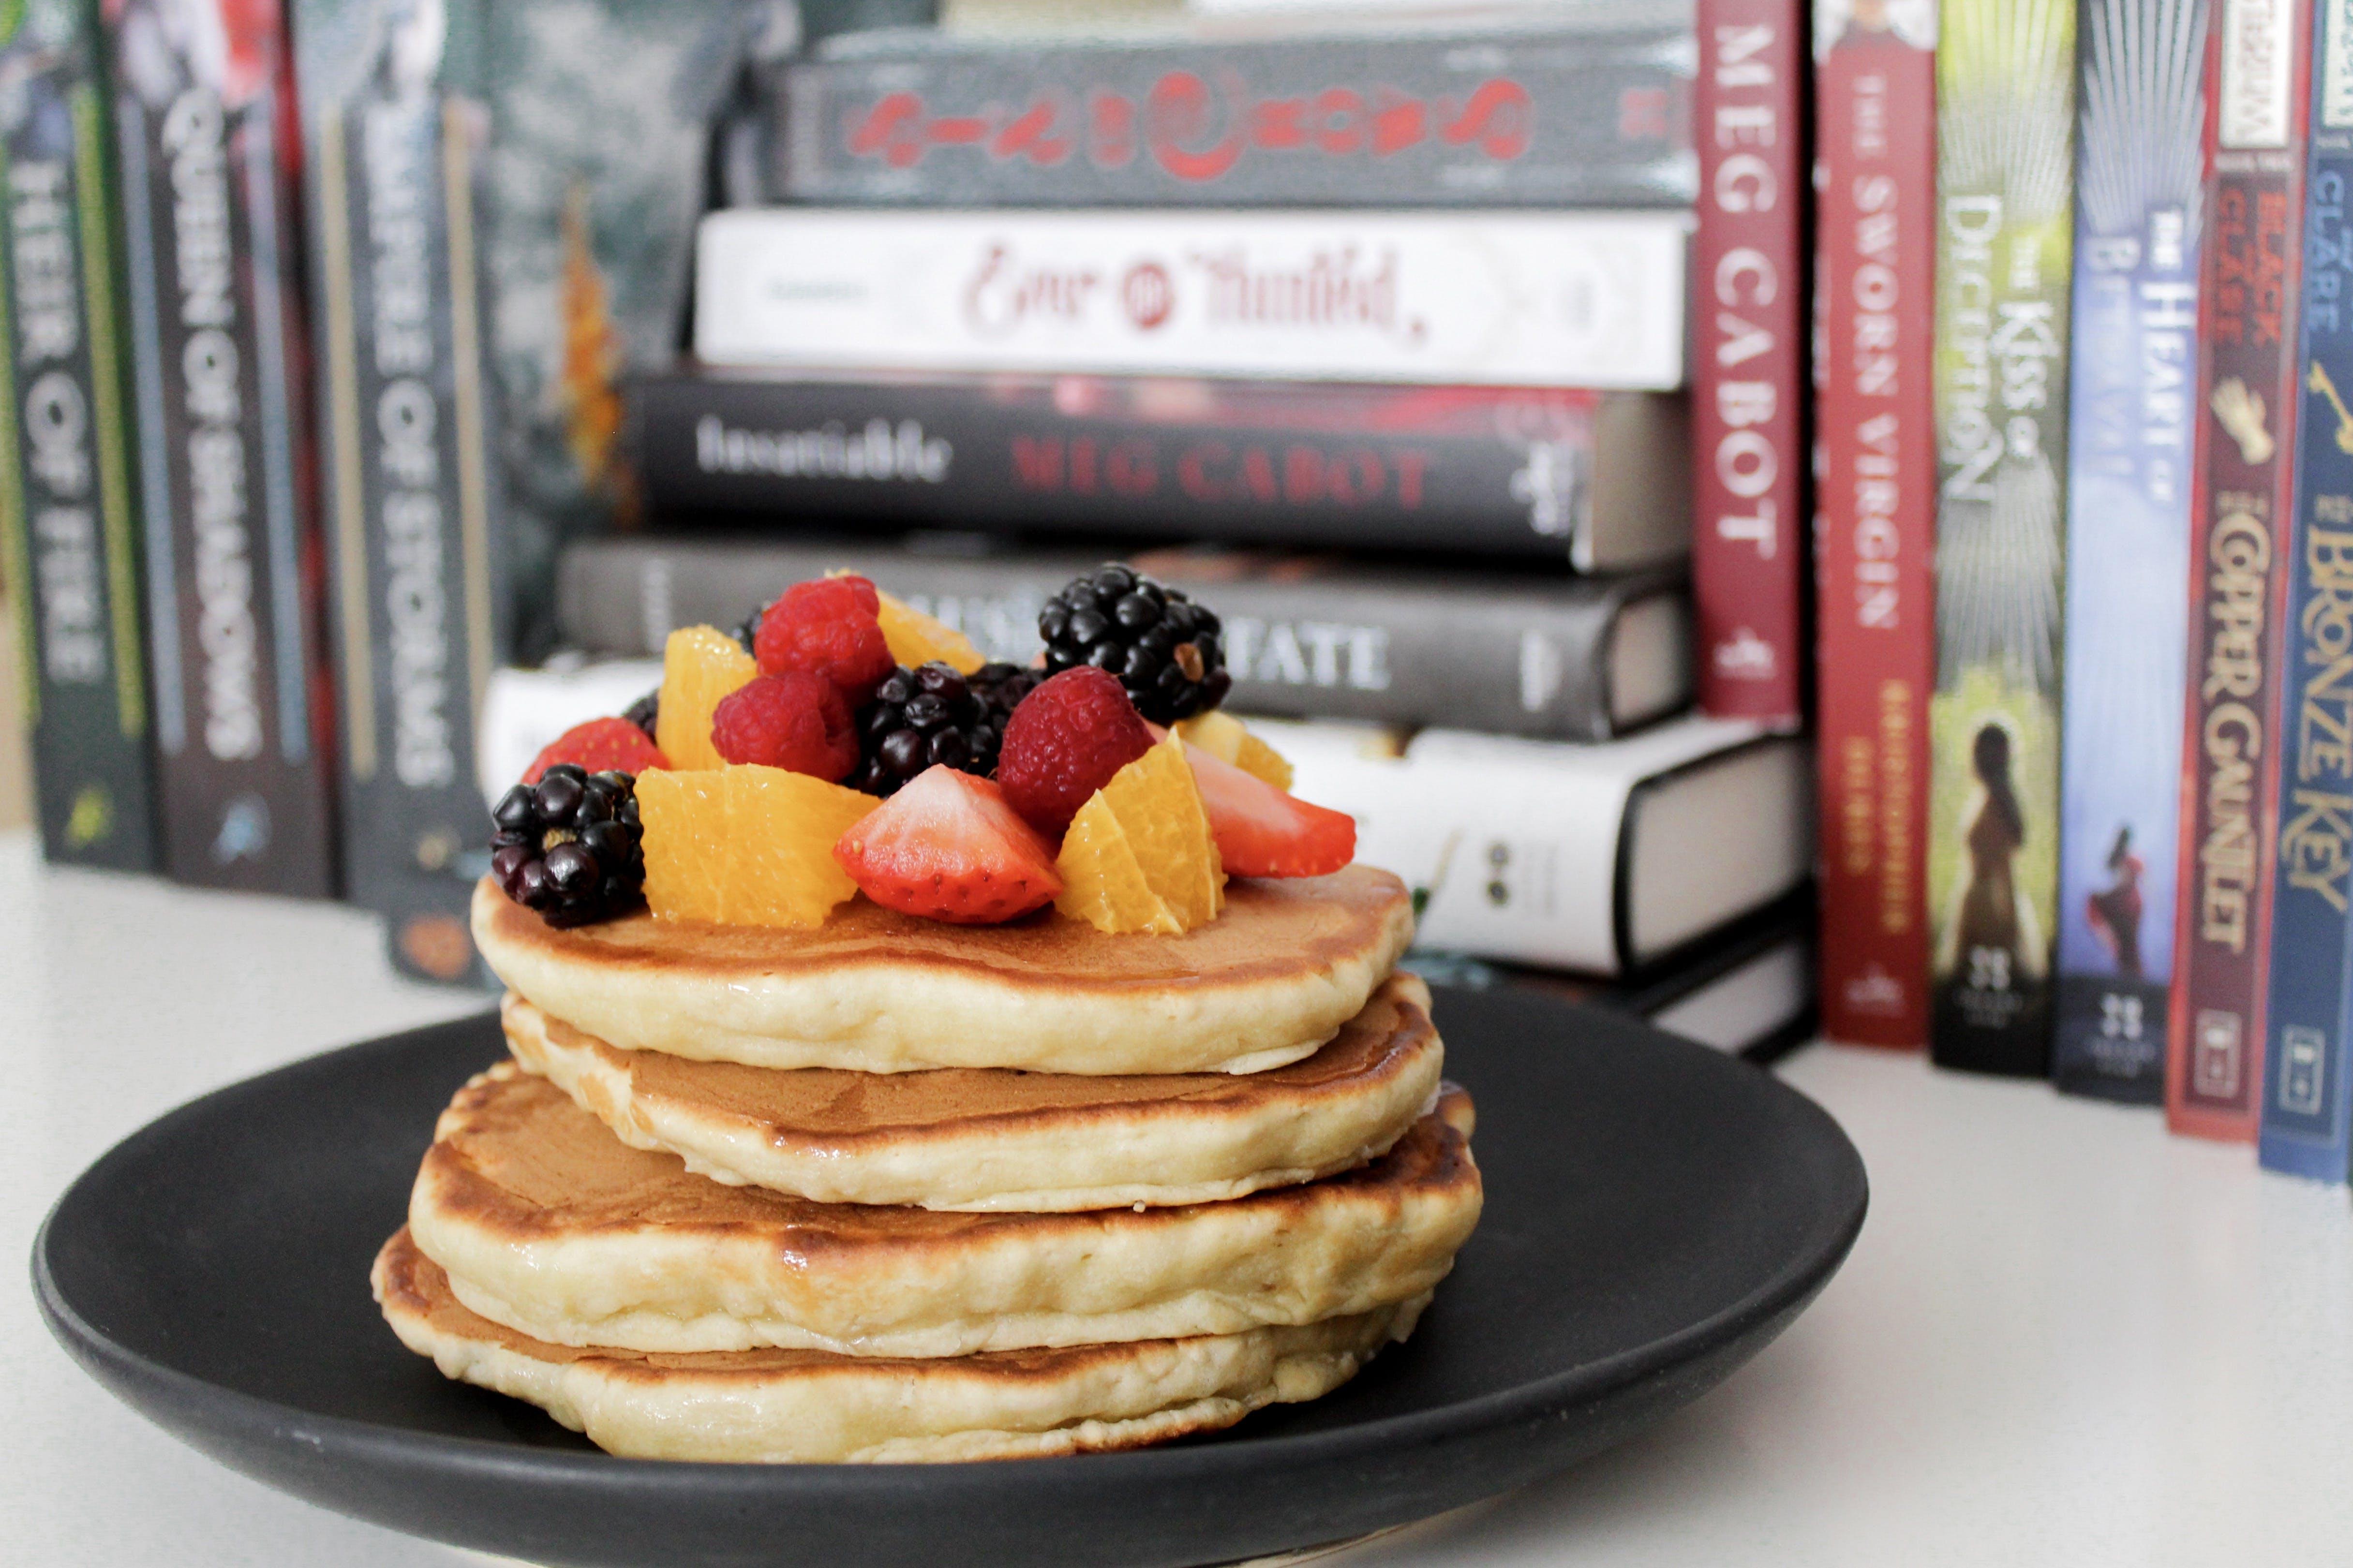 Pancake on Black Plate Near Books